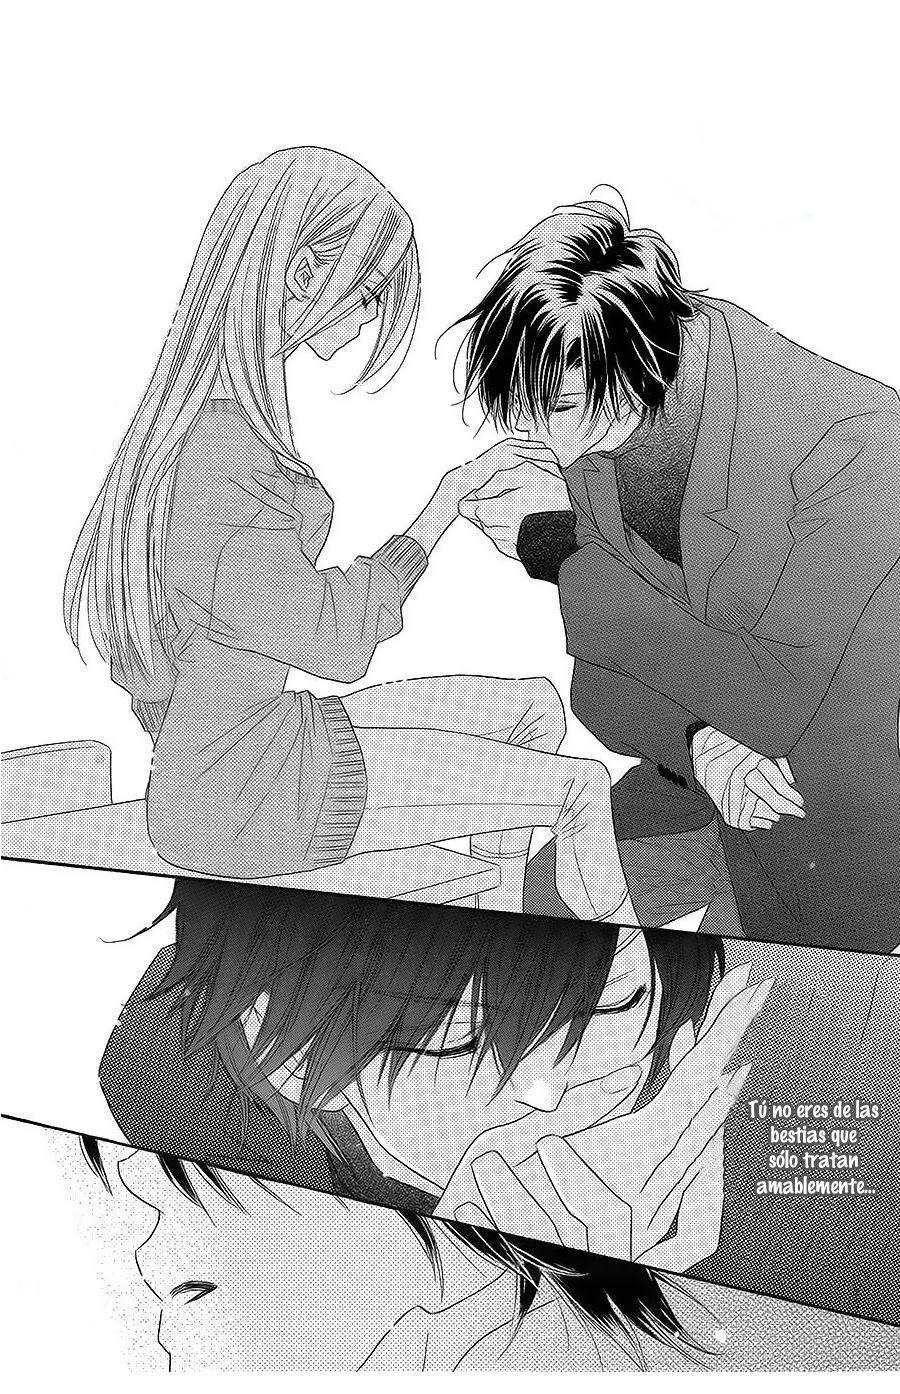 S Love 1 00 Por Totoro Fansub Romantic Anime Romantic Manga